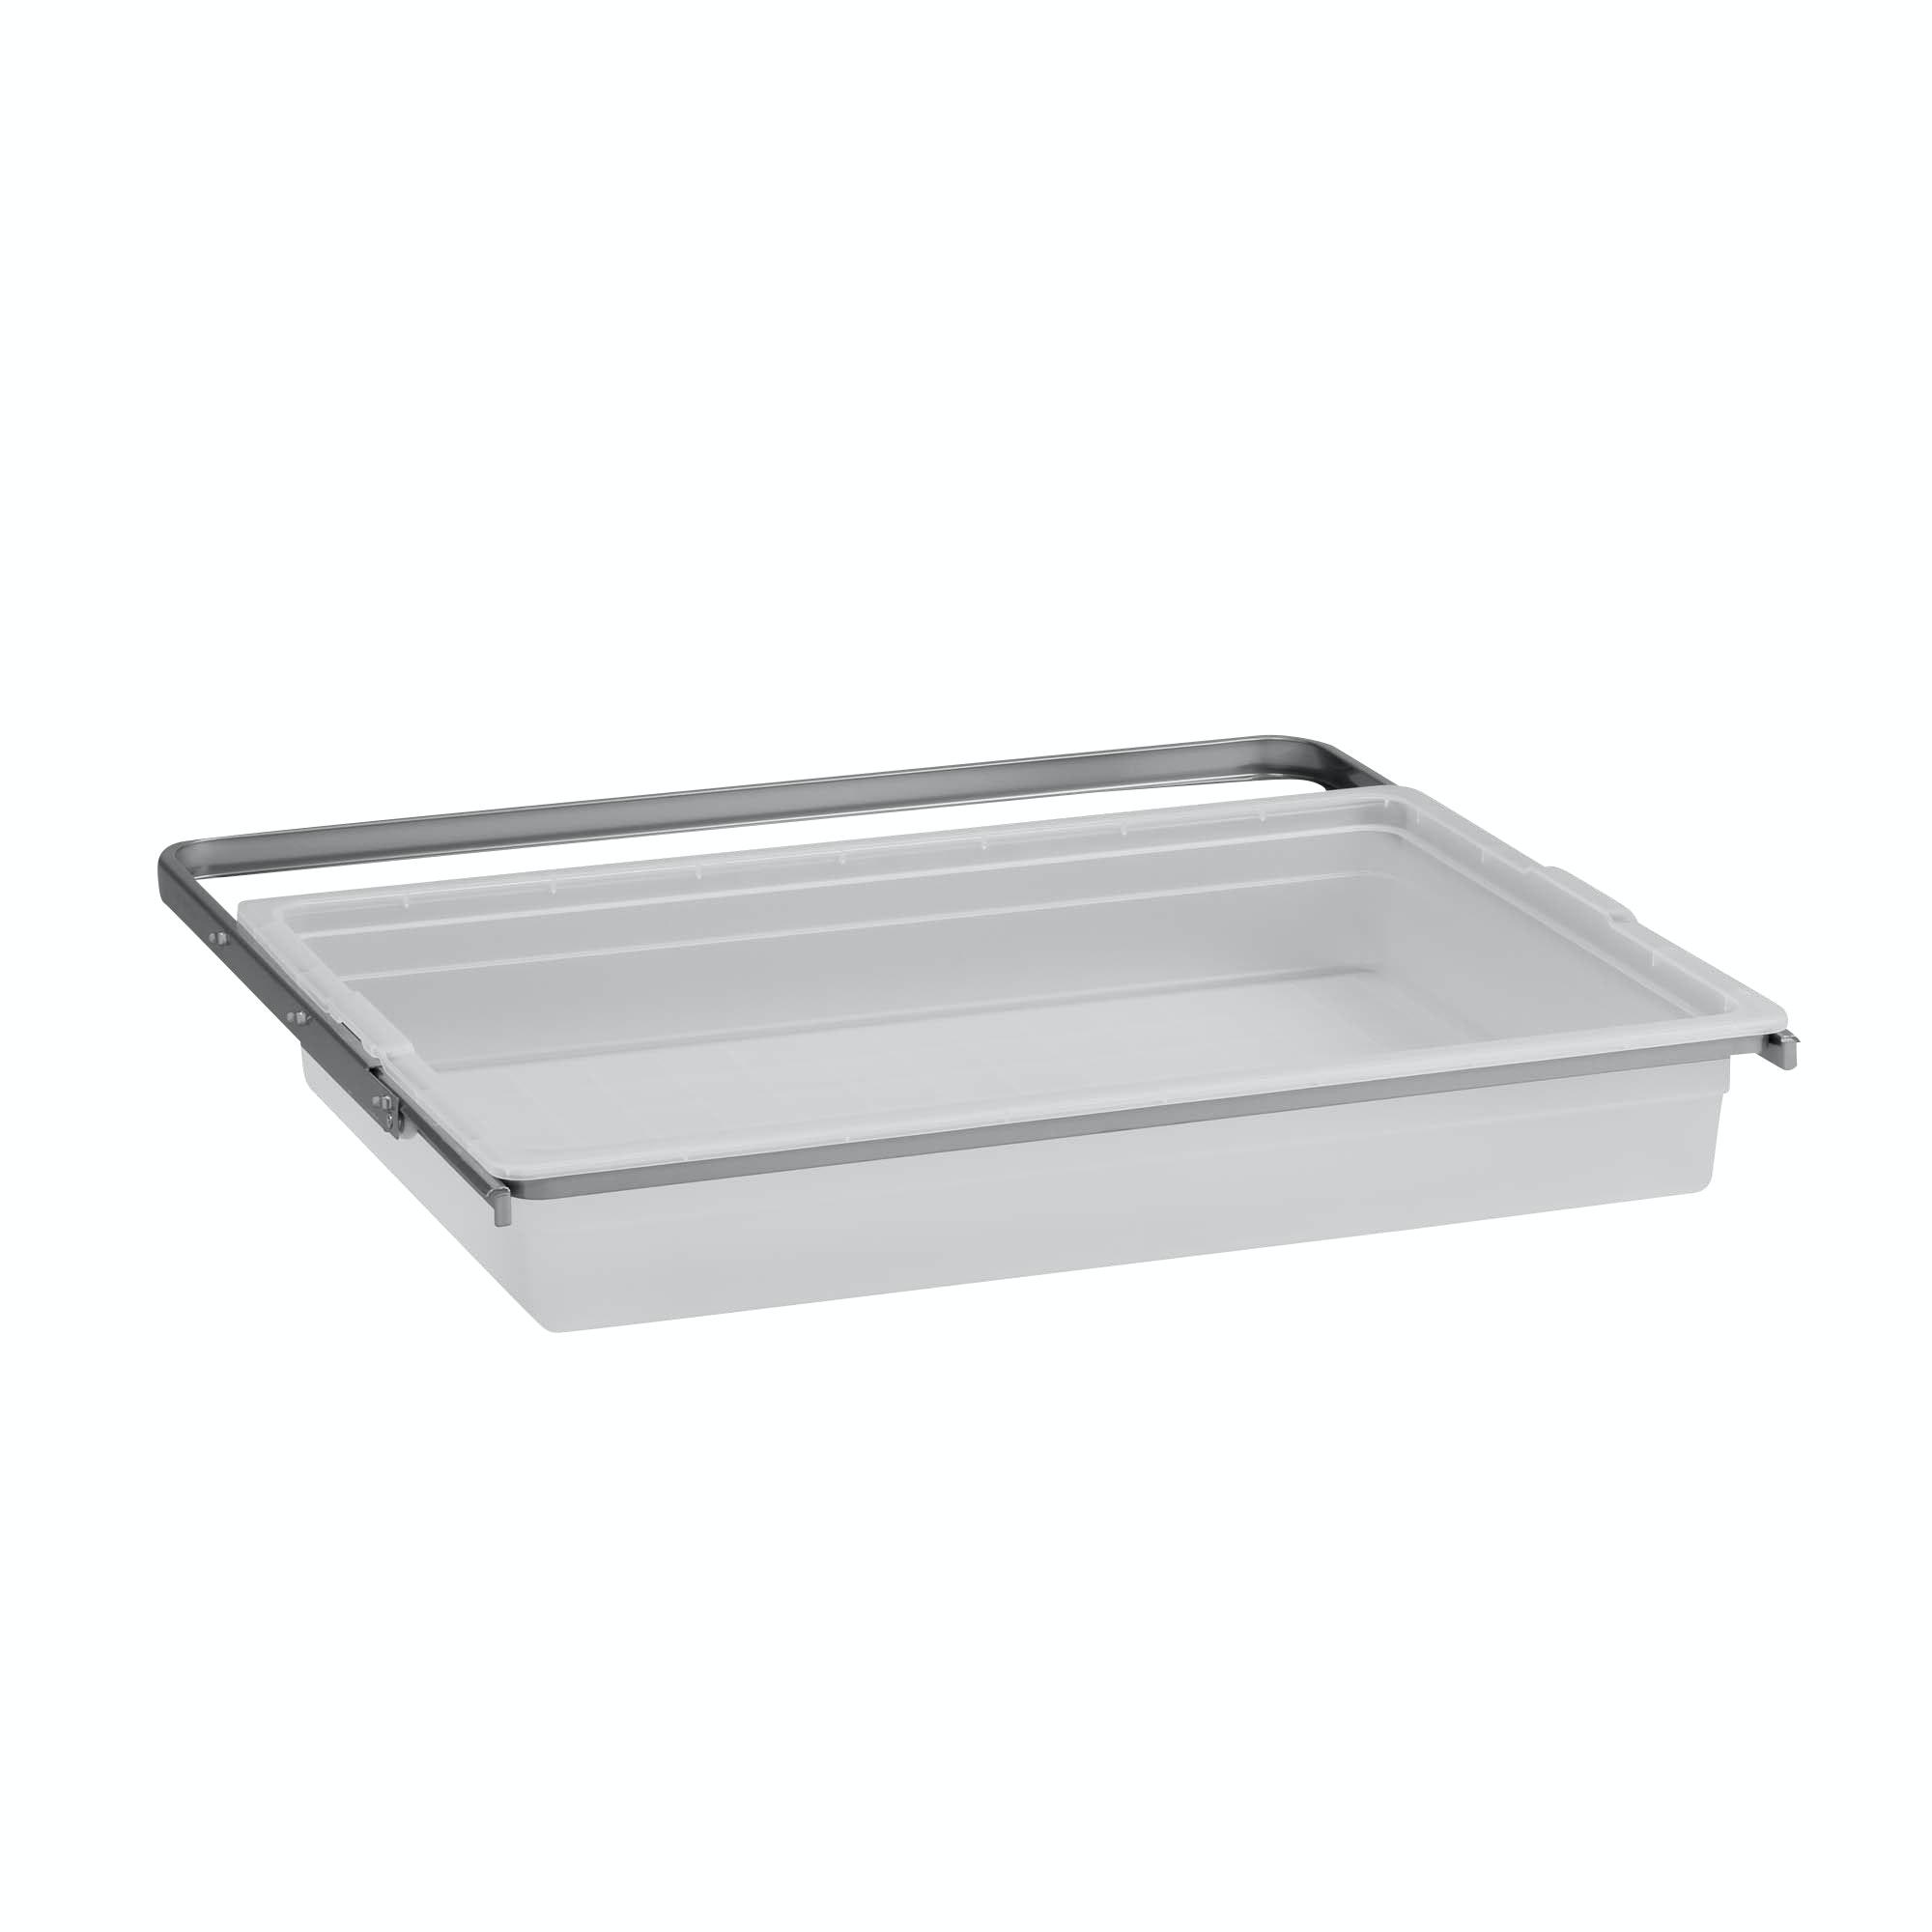 Back Elfa Utdragbar Solid Platinum 605x436x88mm